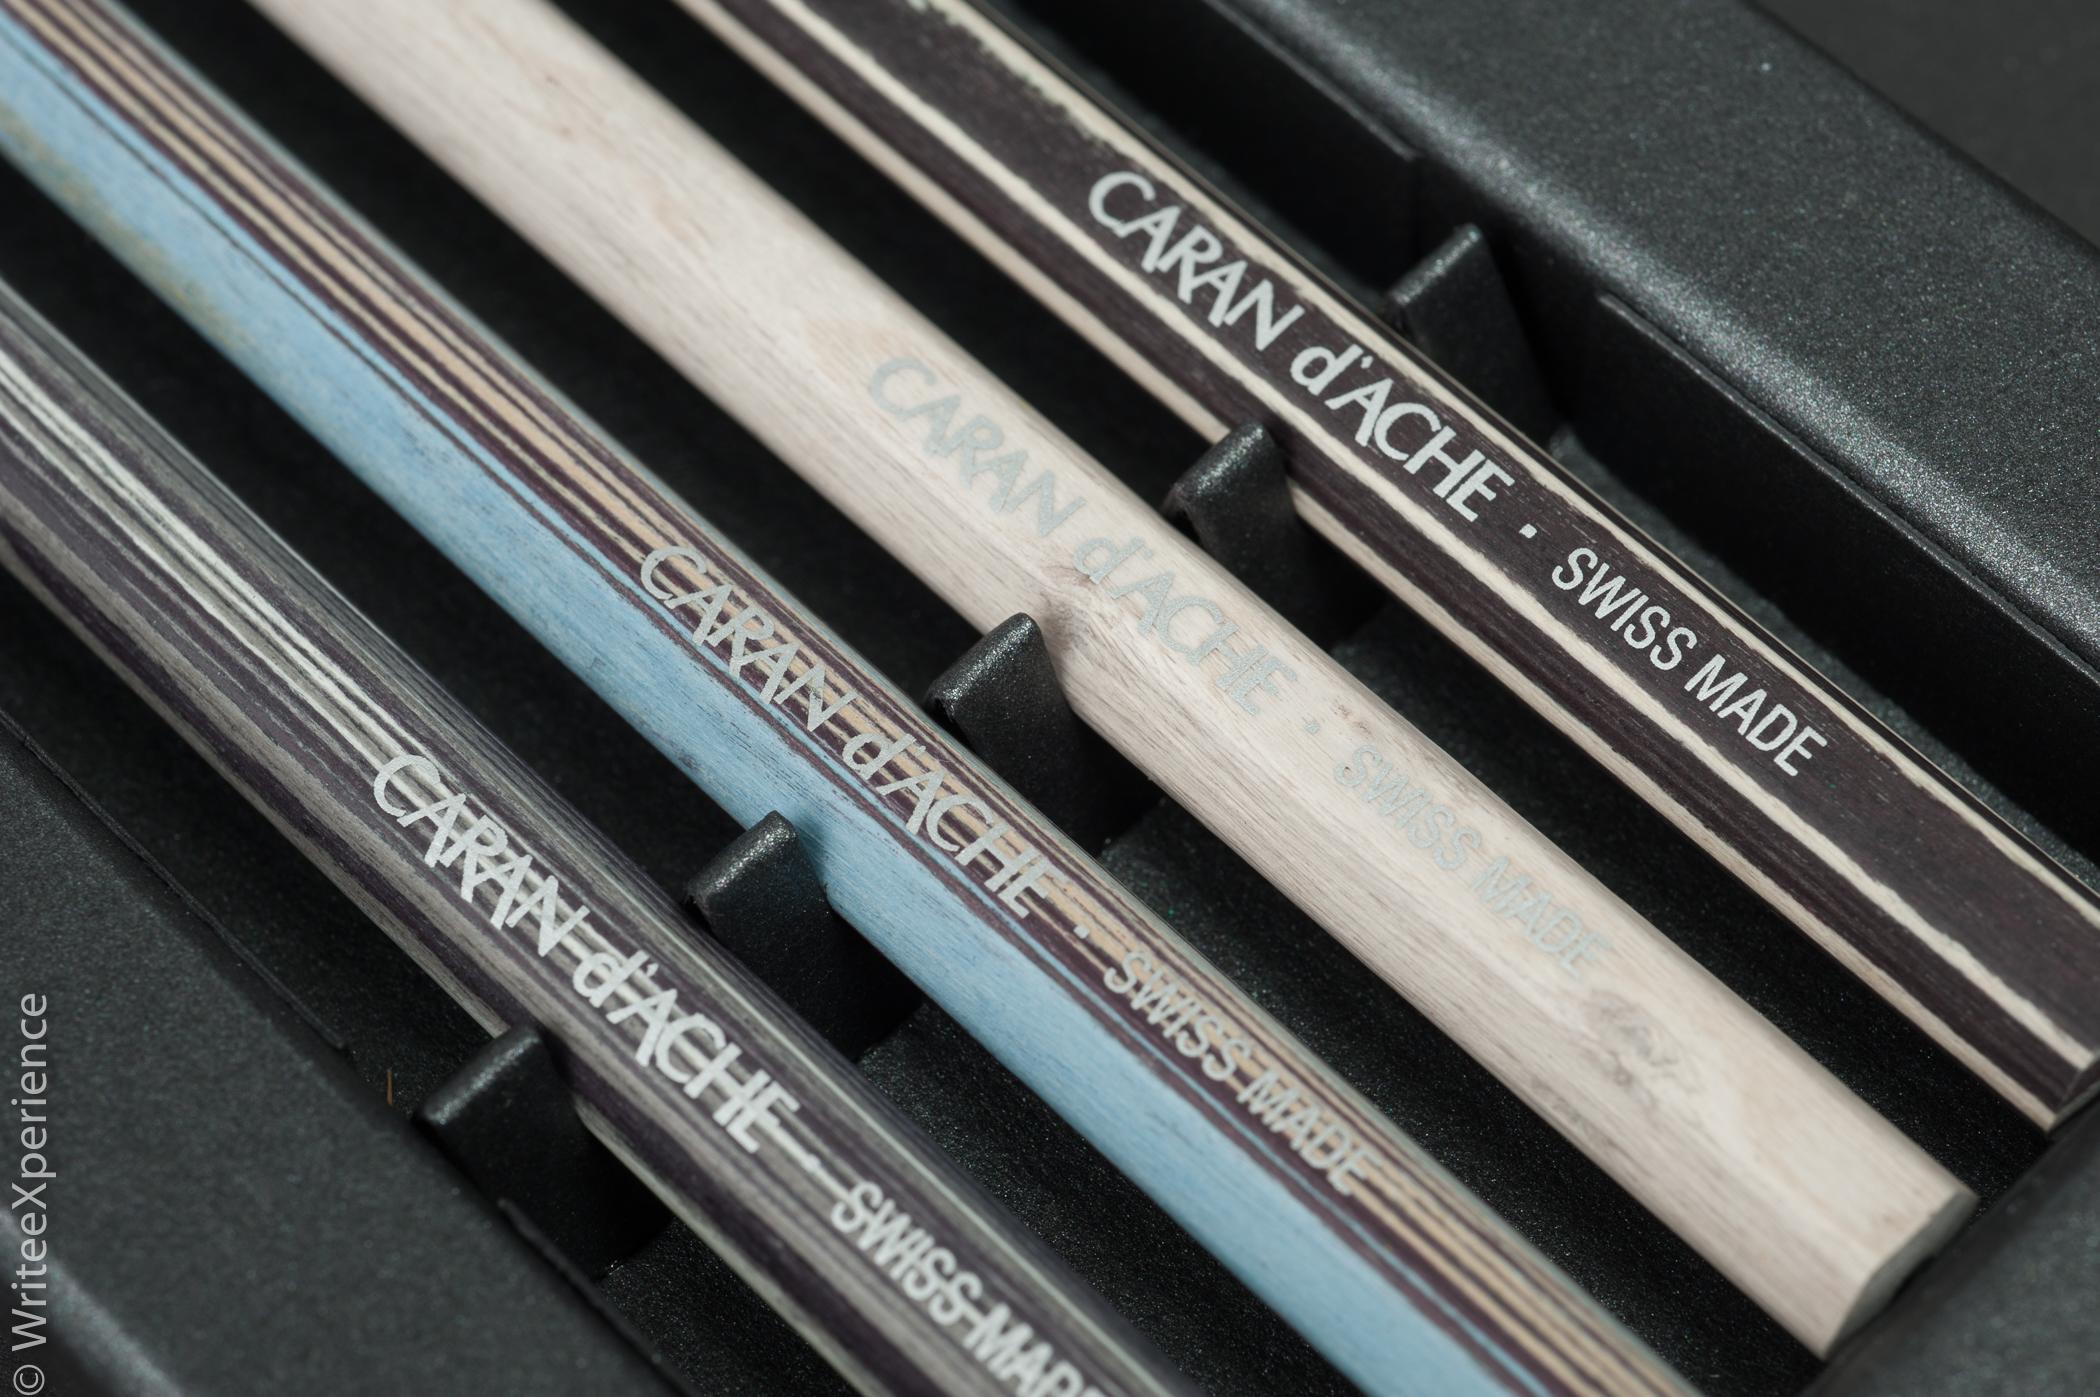 WriteeXperience-Caran-dache-noblewood-pencils-5th-6.jpg